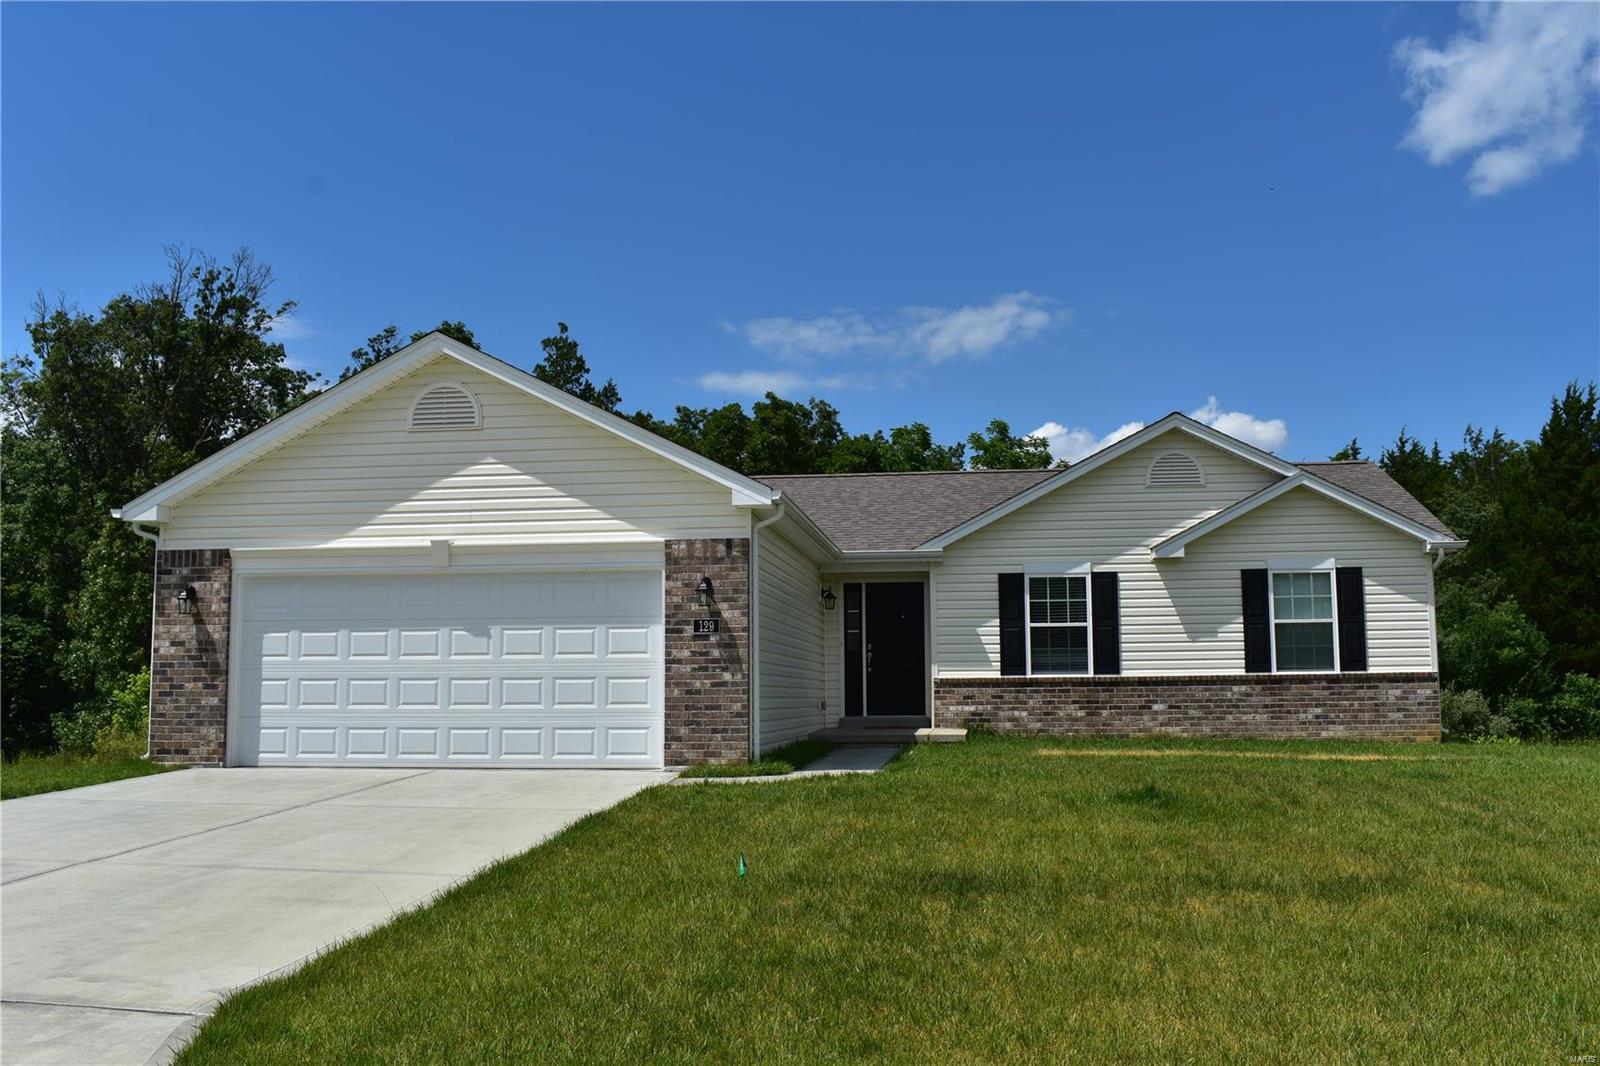 133 TBB-Lot 17 Bryan Ridge Property Photo - Wright City, MO real estate listing